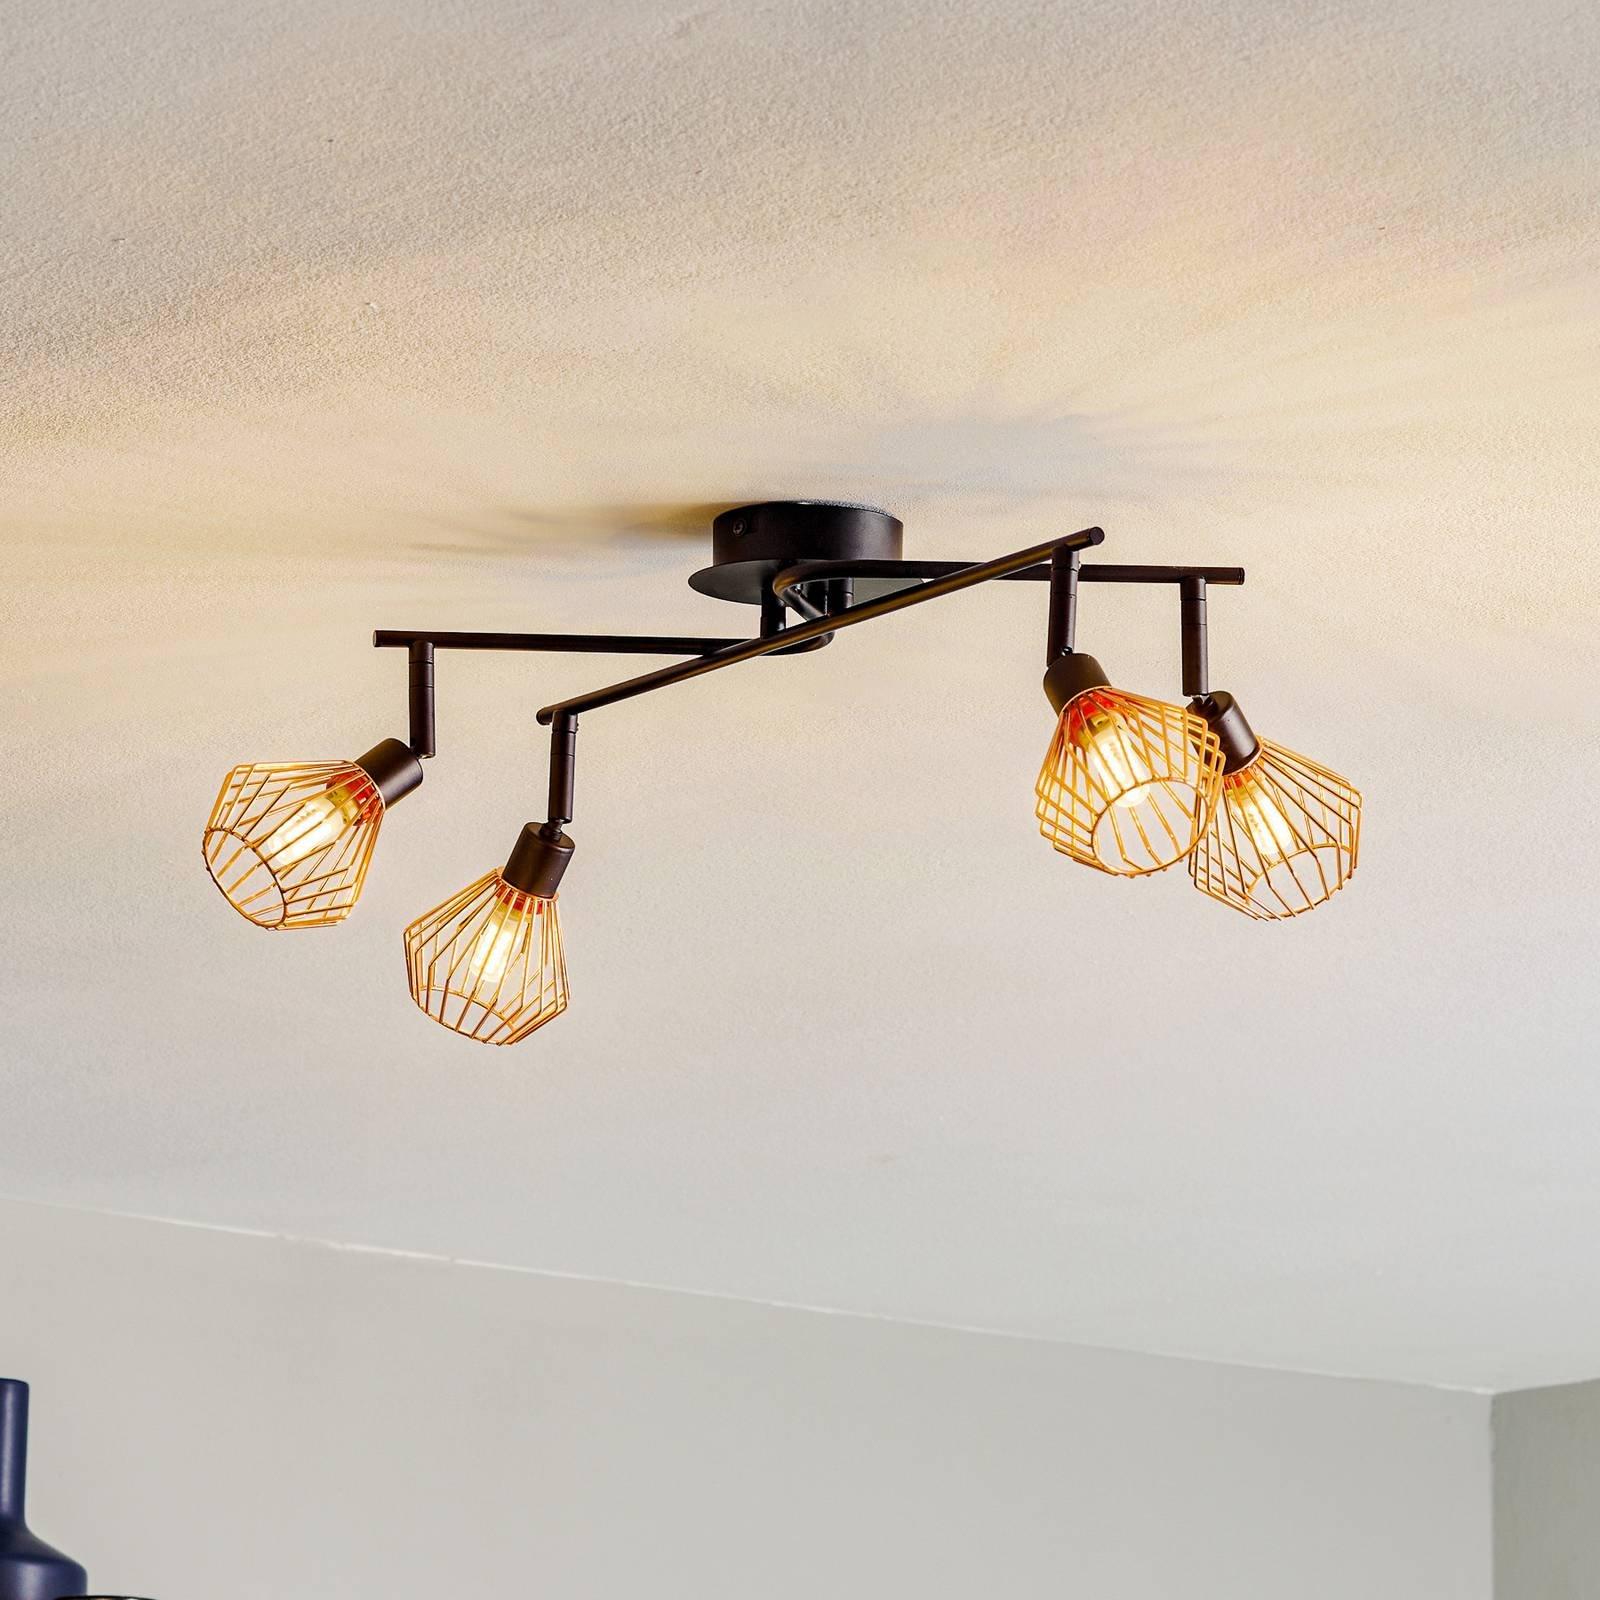 4 bulb Dalma ceiling light